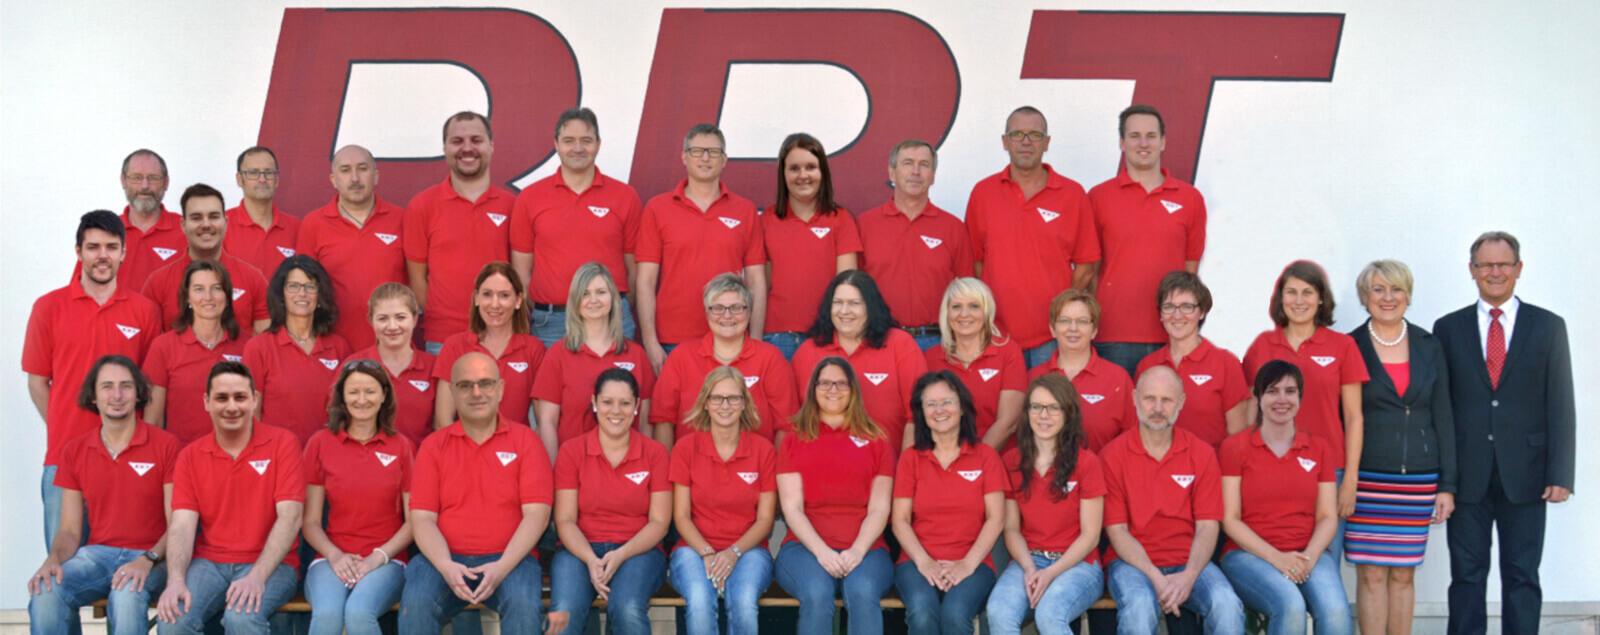 Das BBT-Teamfoto